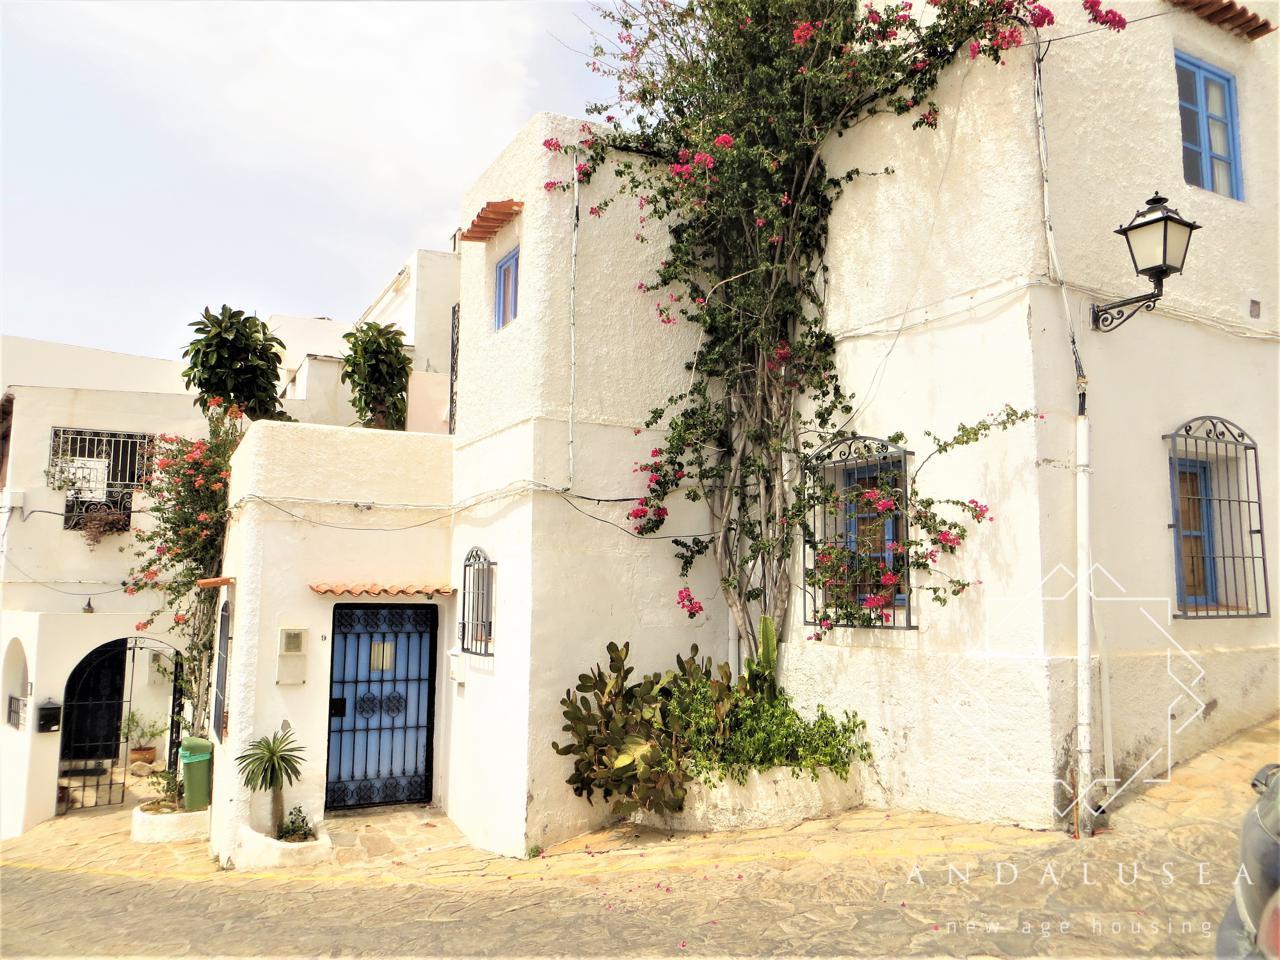 Casa / chalet Cuesta del Castillo, Mojácar